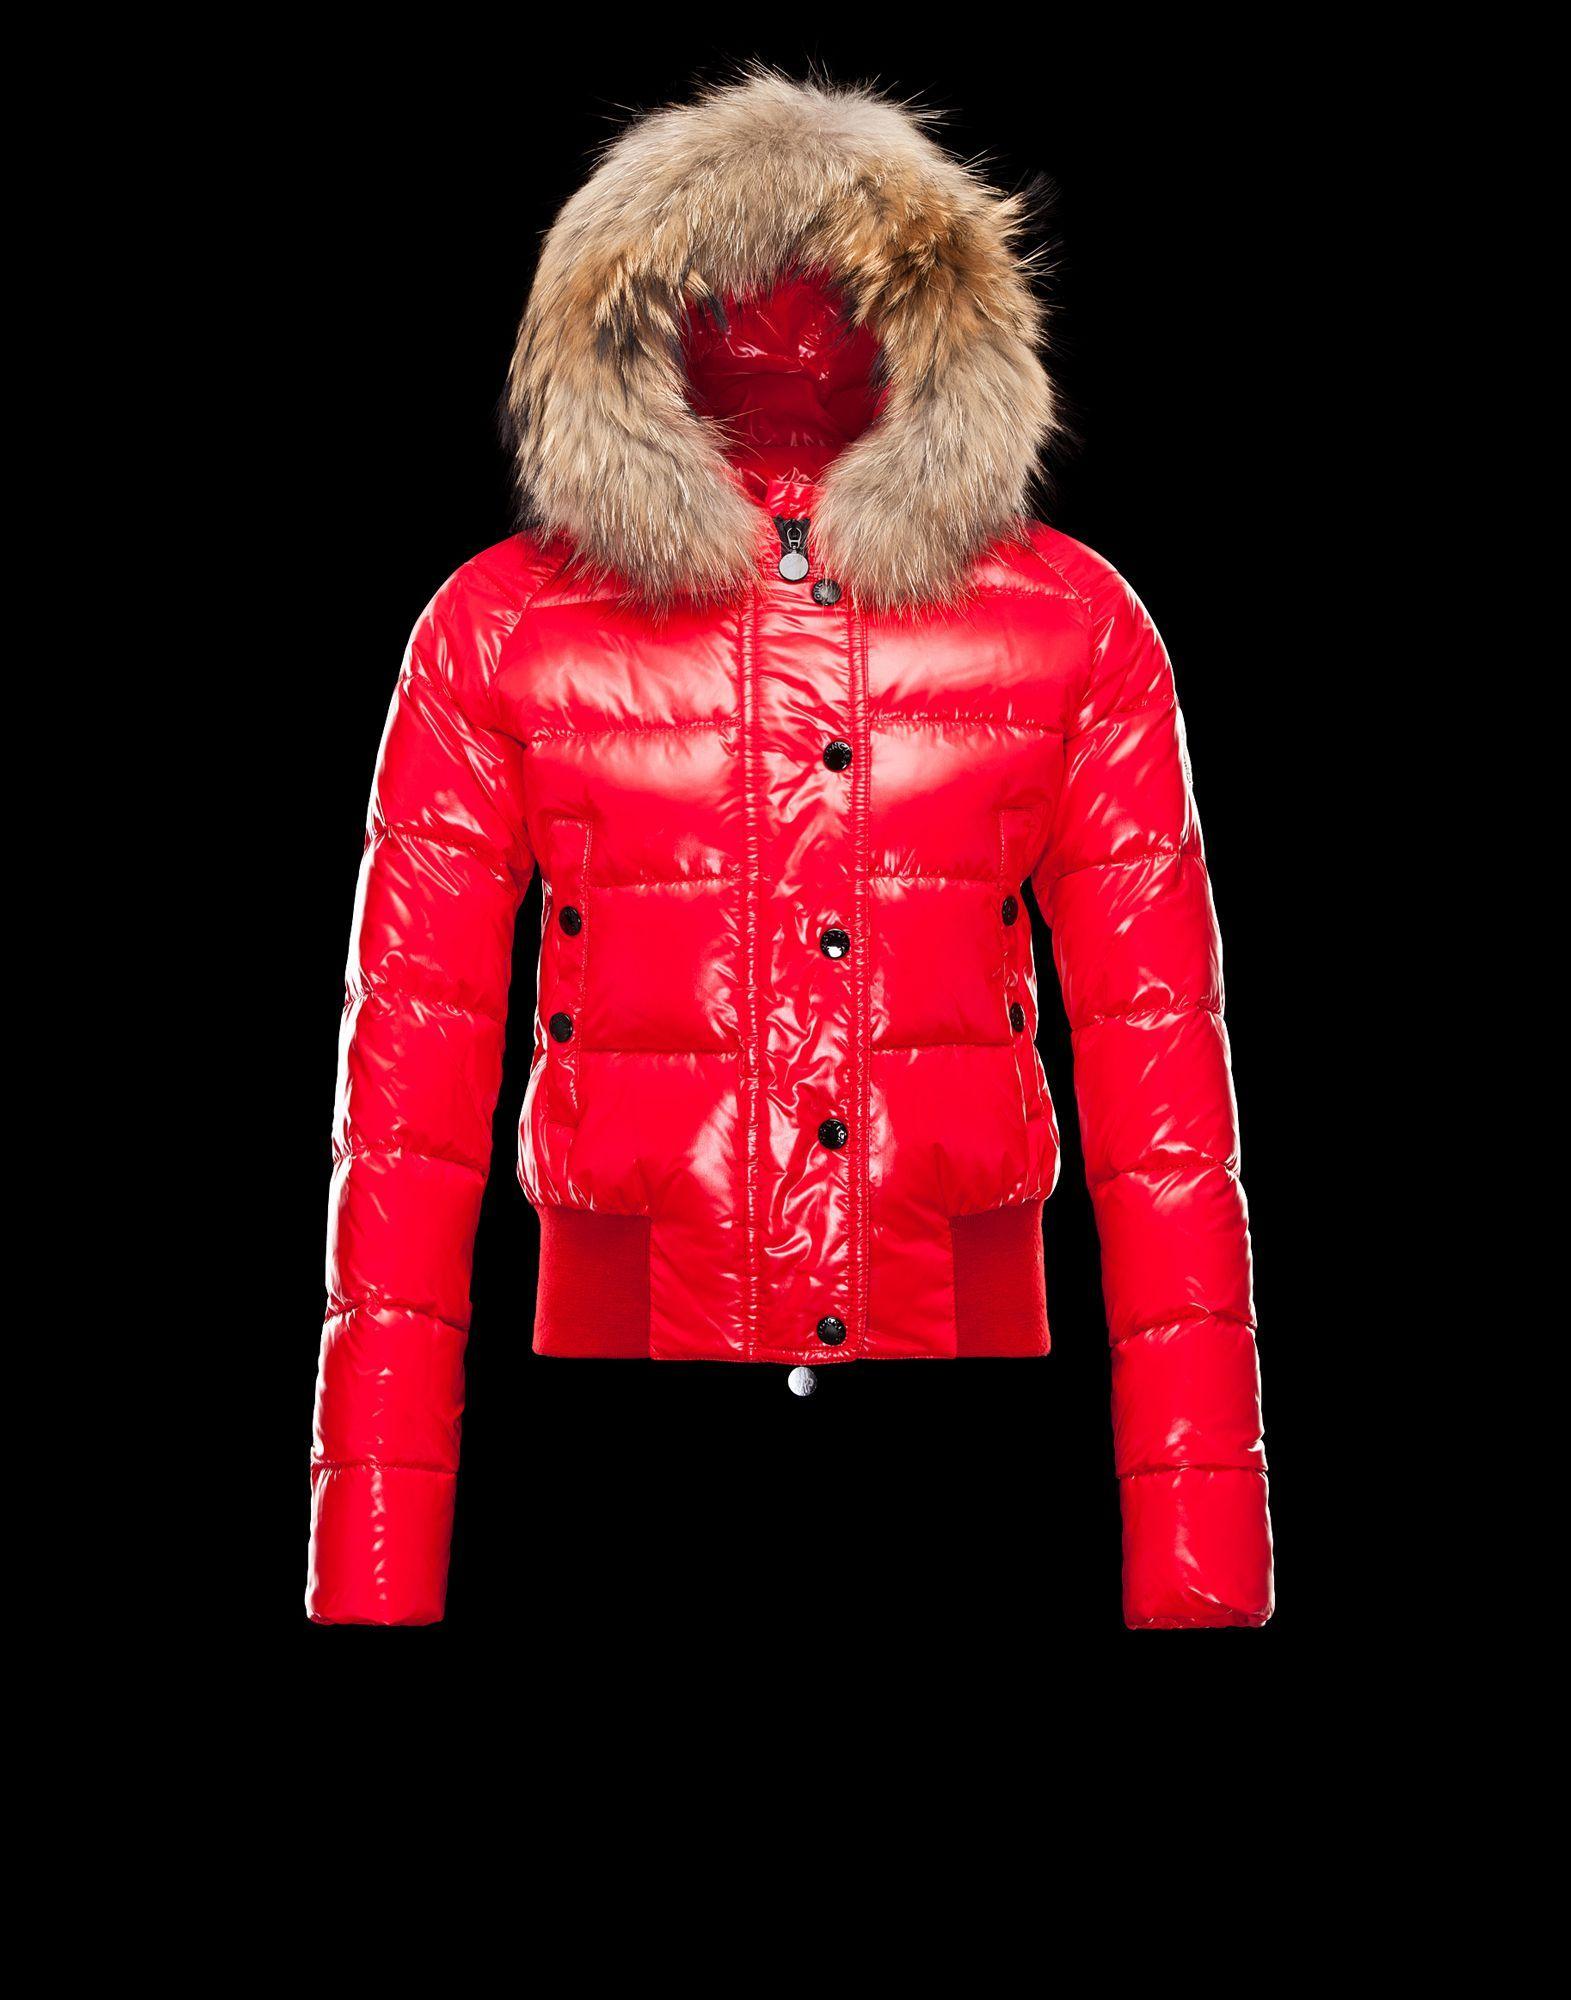 a7959322e3b Jacket Women - Outerwear Women on Moncler Online Store  1350